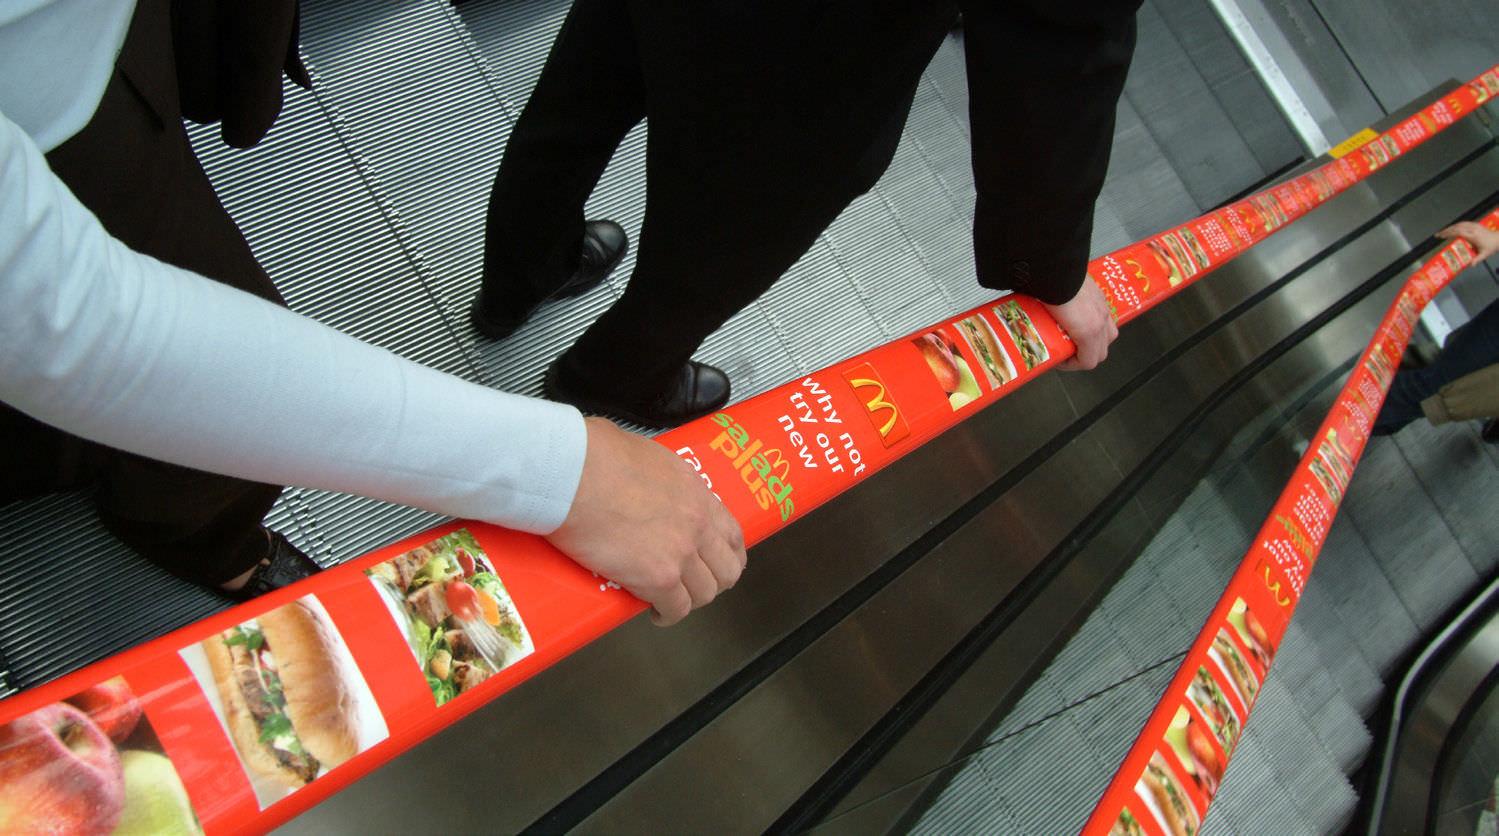 Escalator handrail / advertising - ADRAIL™ - EHC Global - Videos